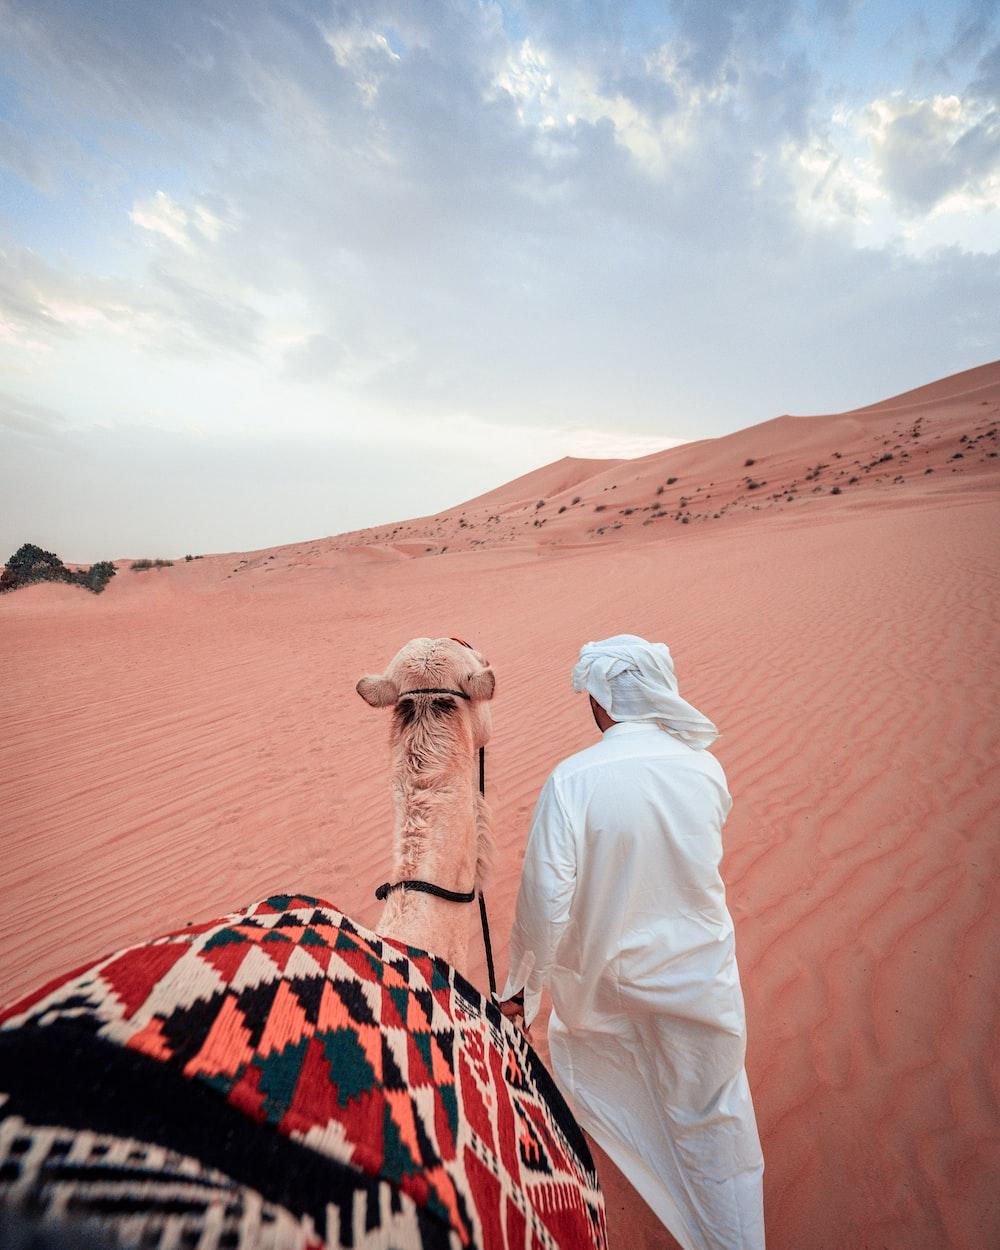 Dubai Desert Pictures | Download Free Images on Unsplash